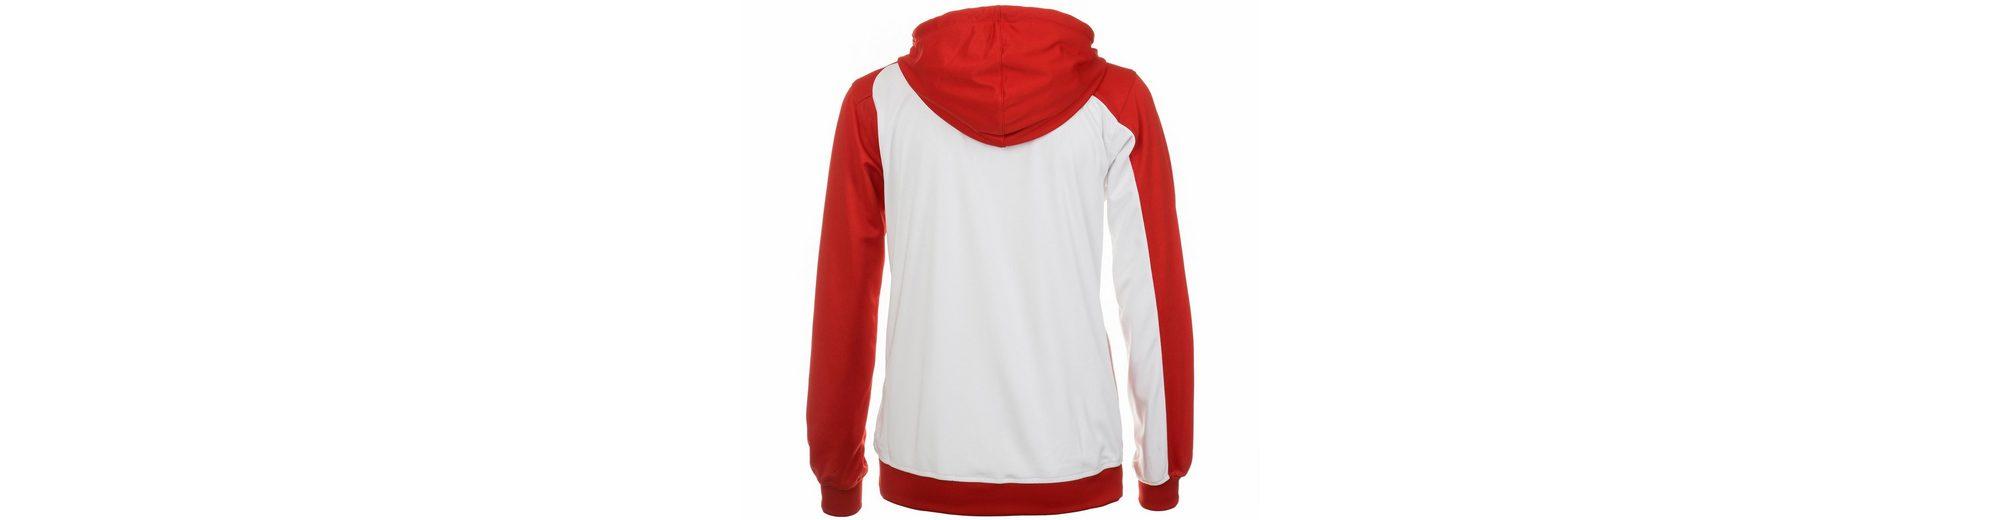 ERIMA Club 1900 Trainingsjacke mit Kapuze Damen Billig Verkauf Beliebt Günstig Kaufen Eastbay YNuo8E